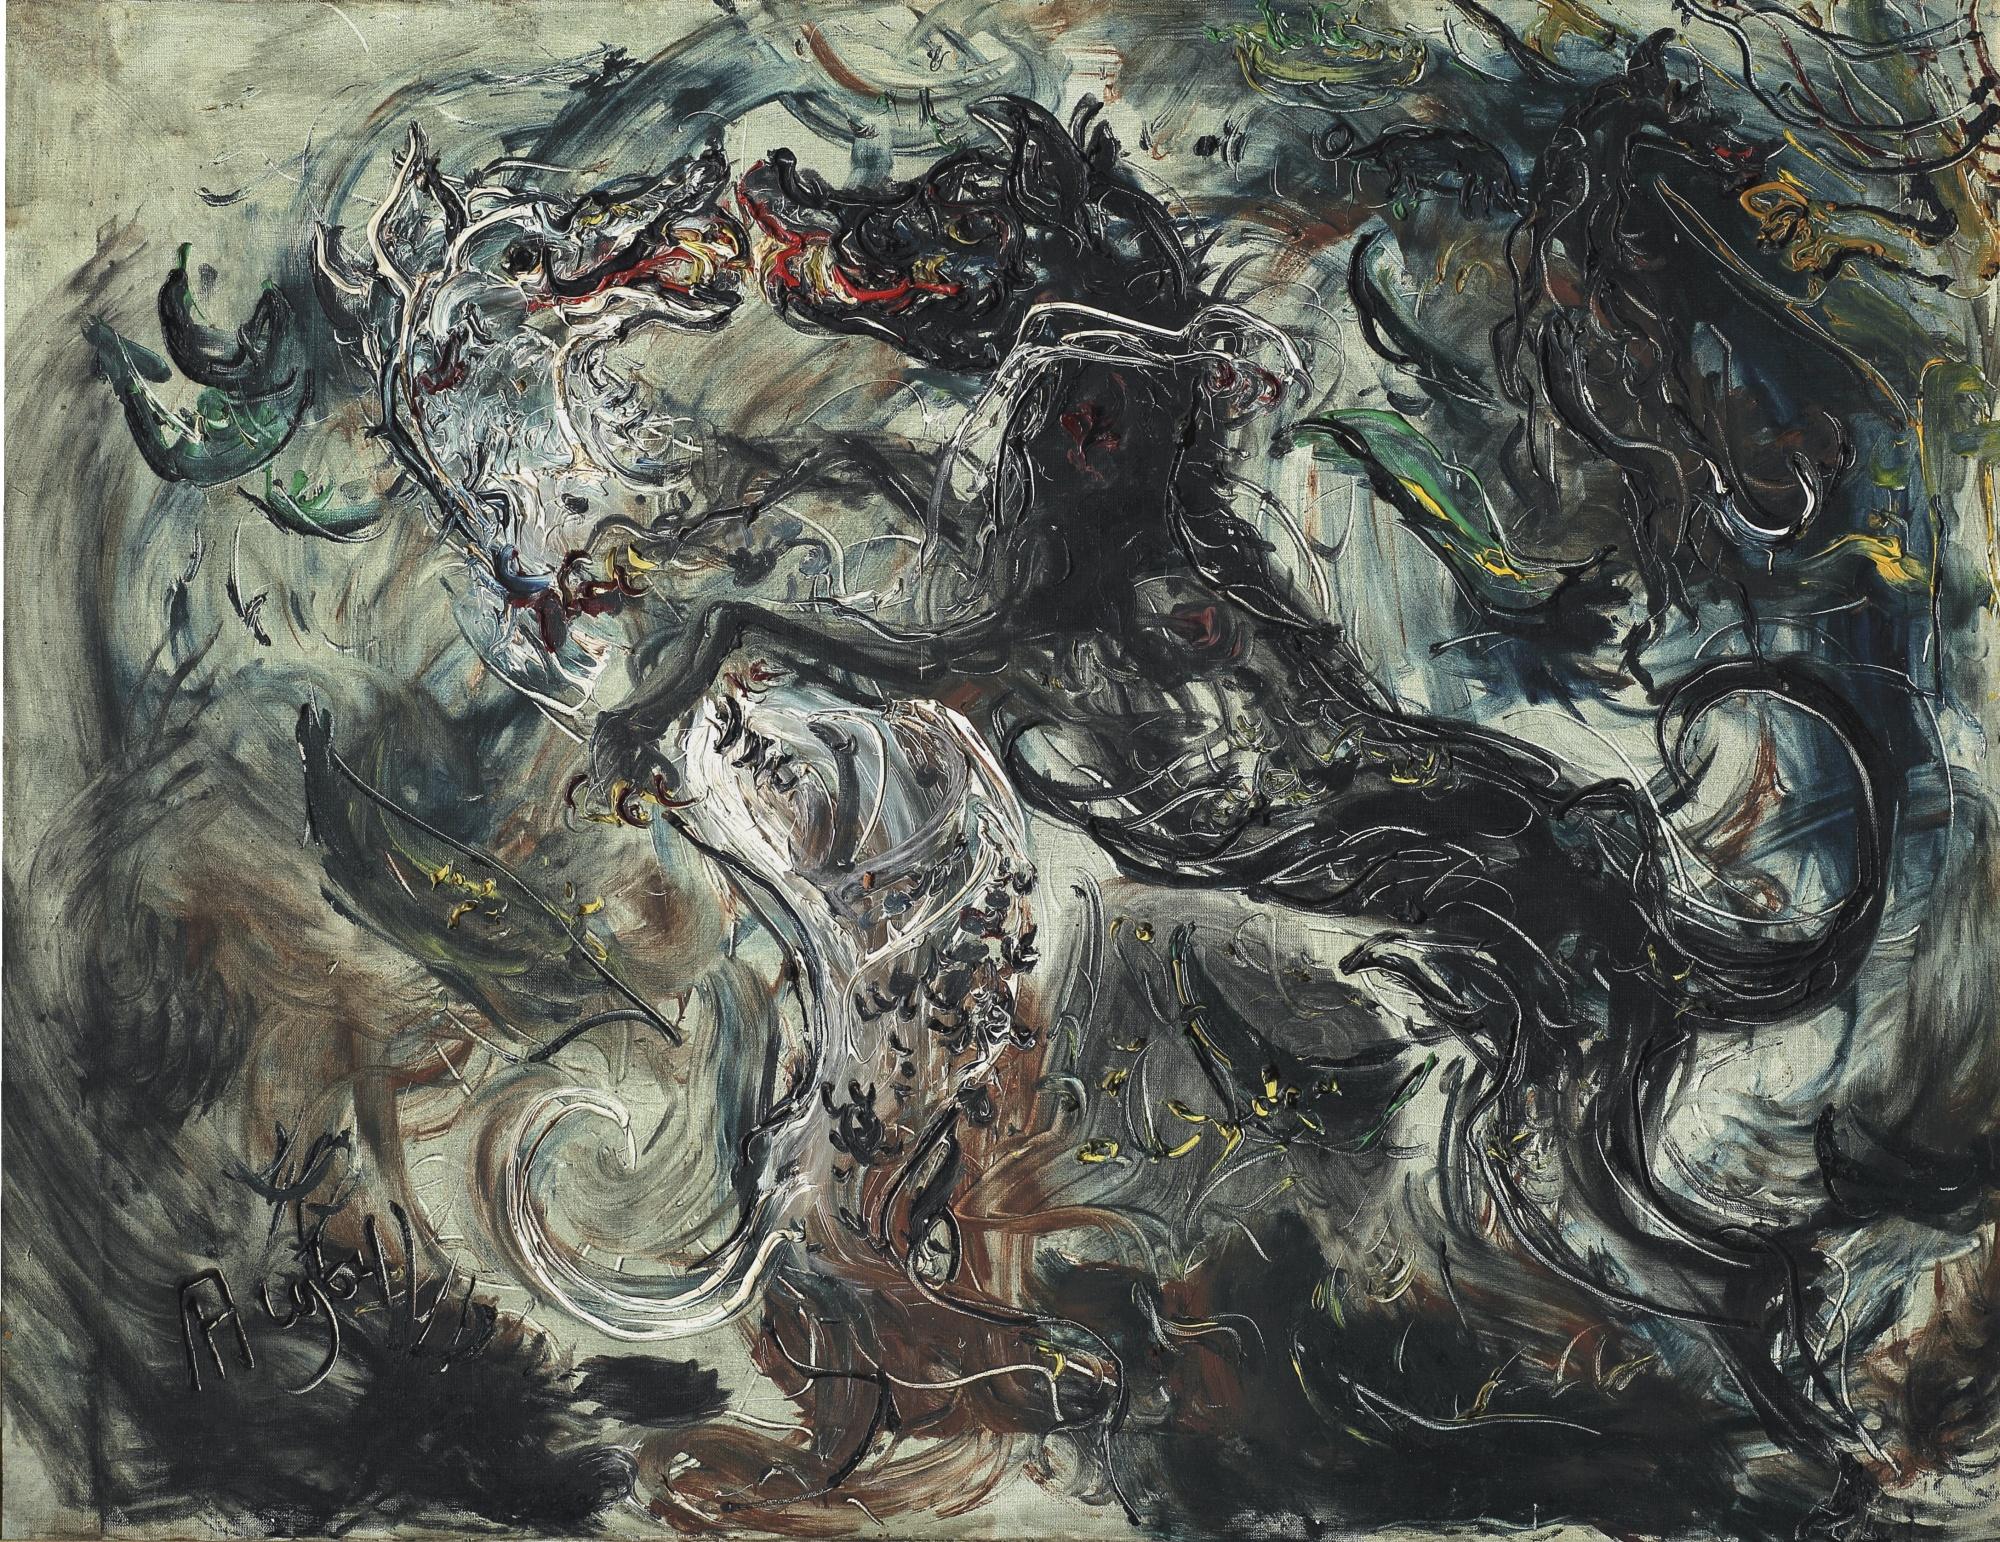 Affandi-Dogs Fighting-1964